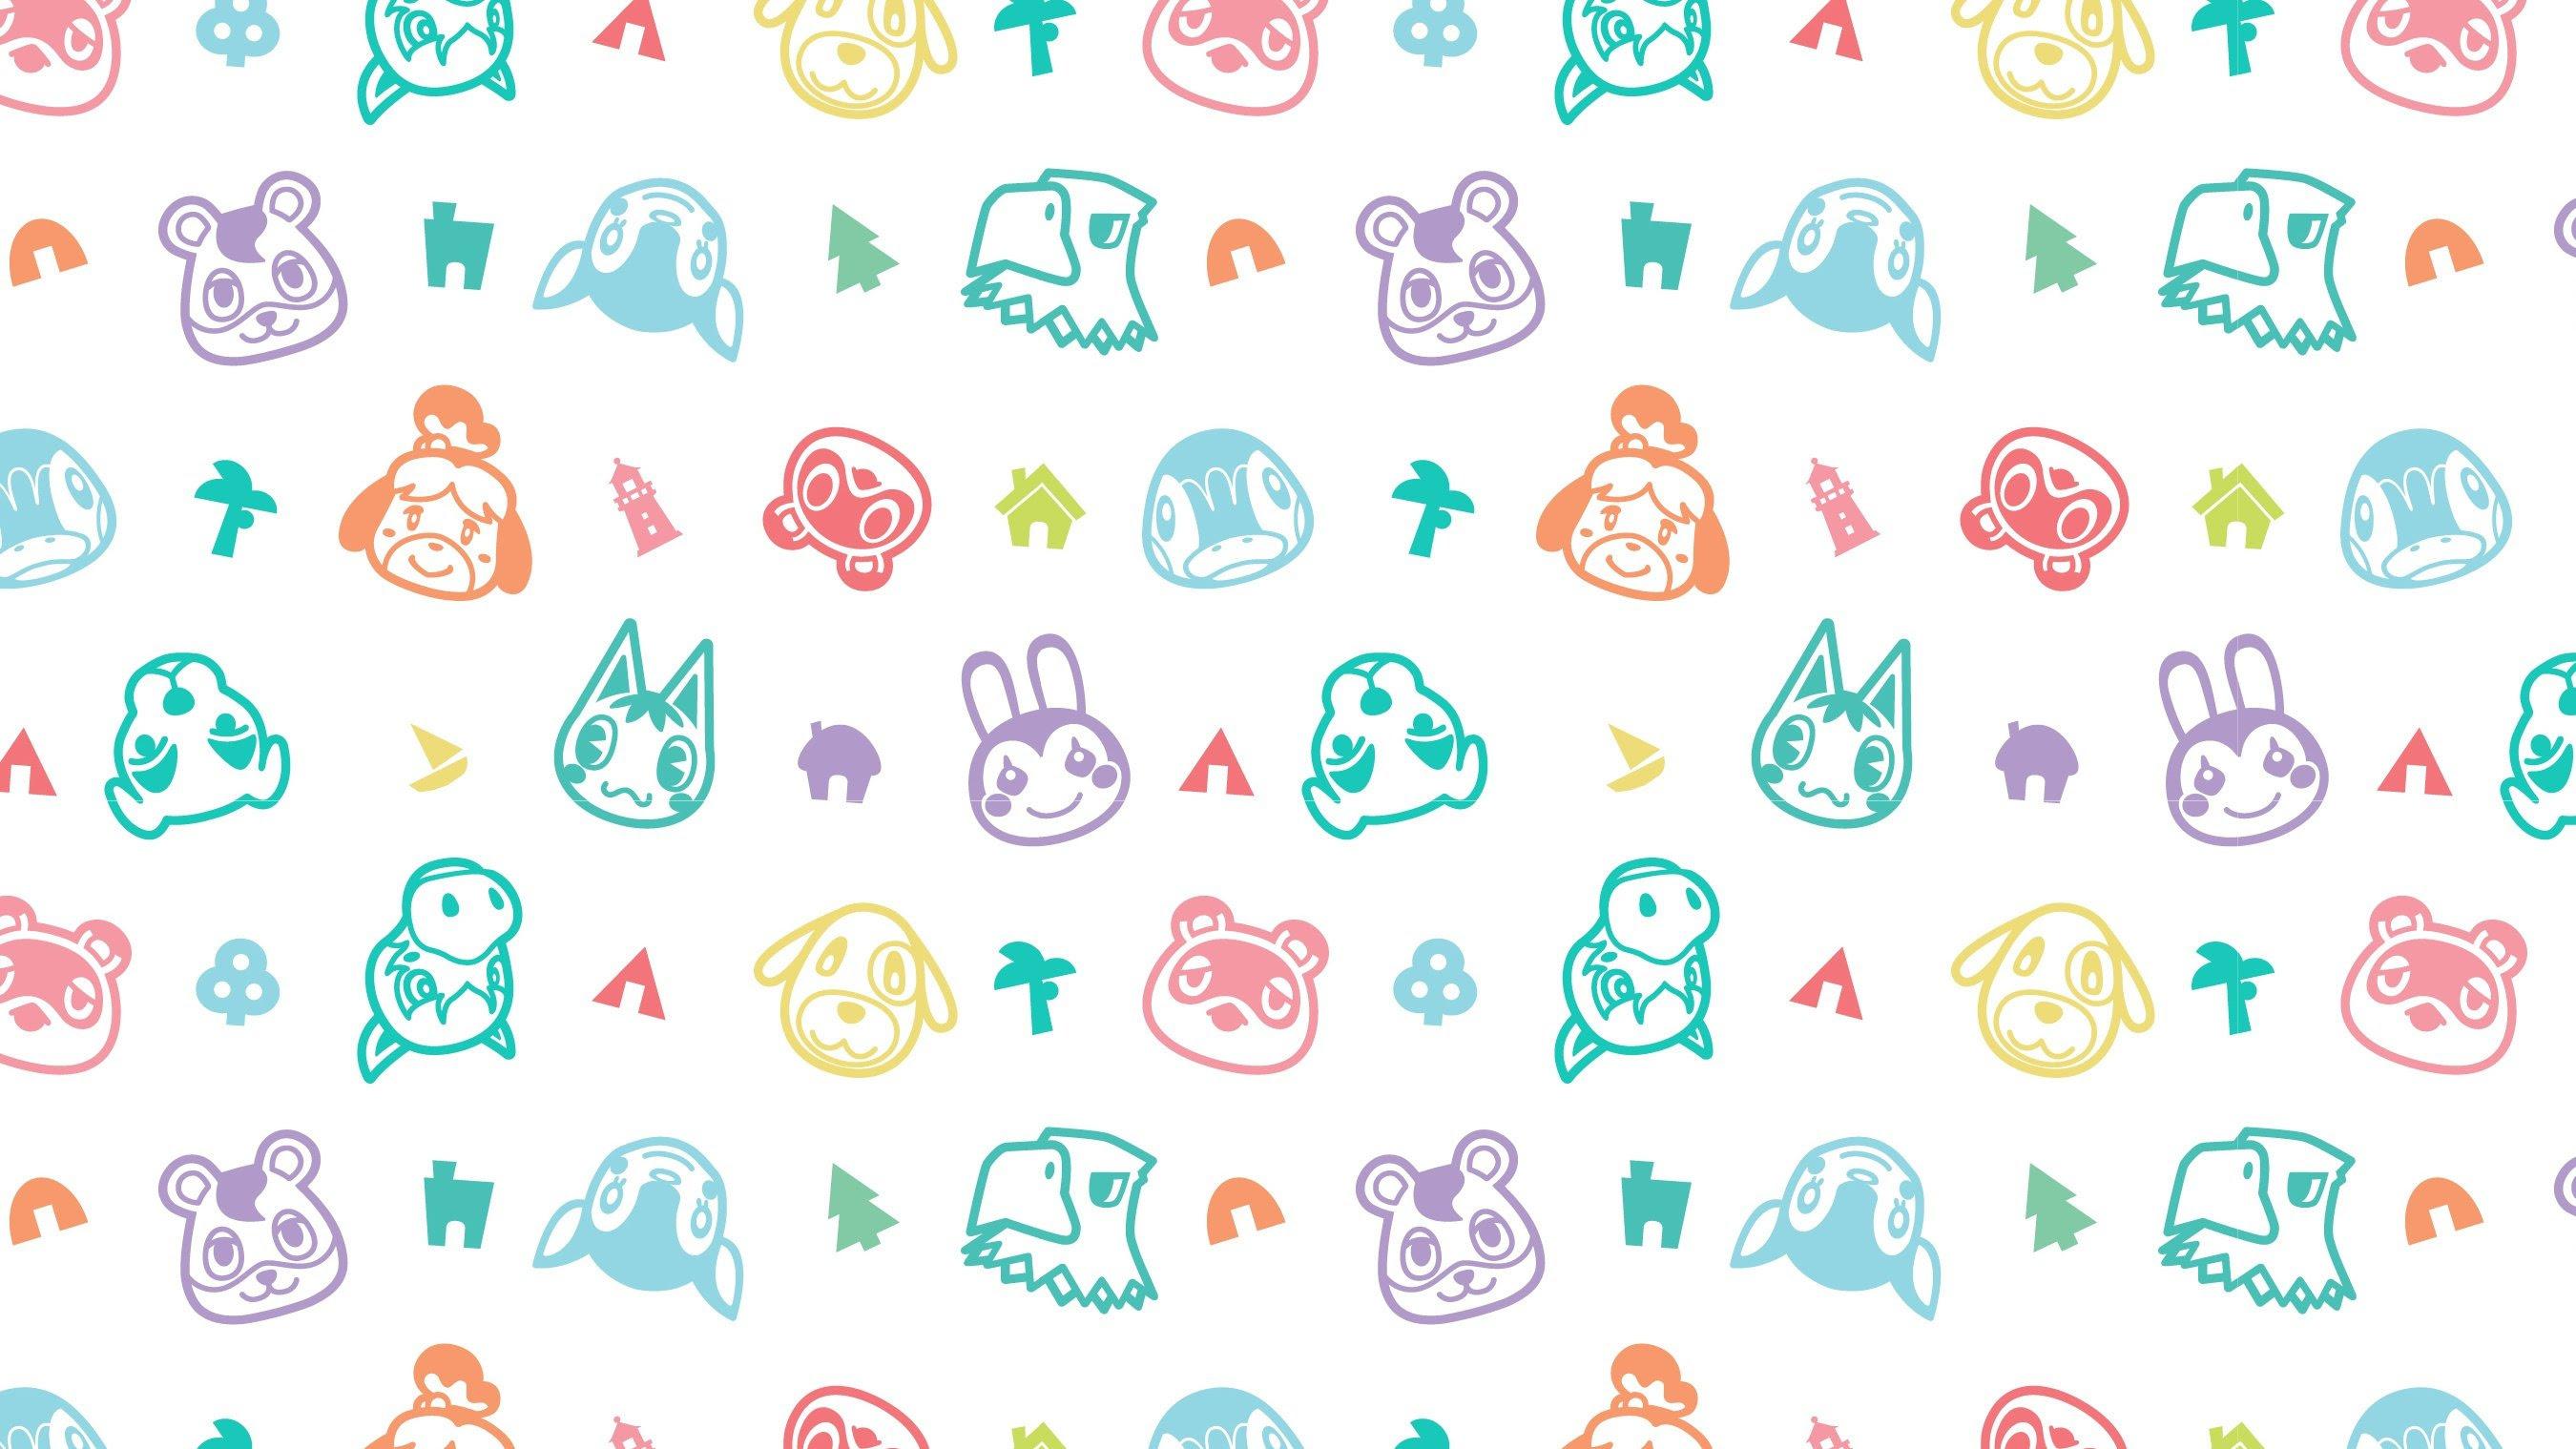 My Nintendo Celebrates Animal Crossing New Horizons With Two